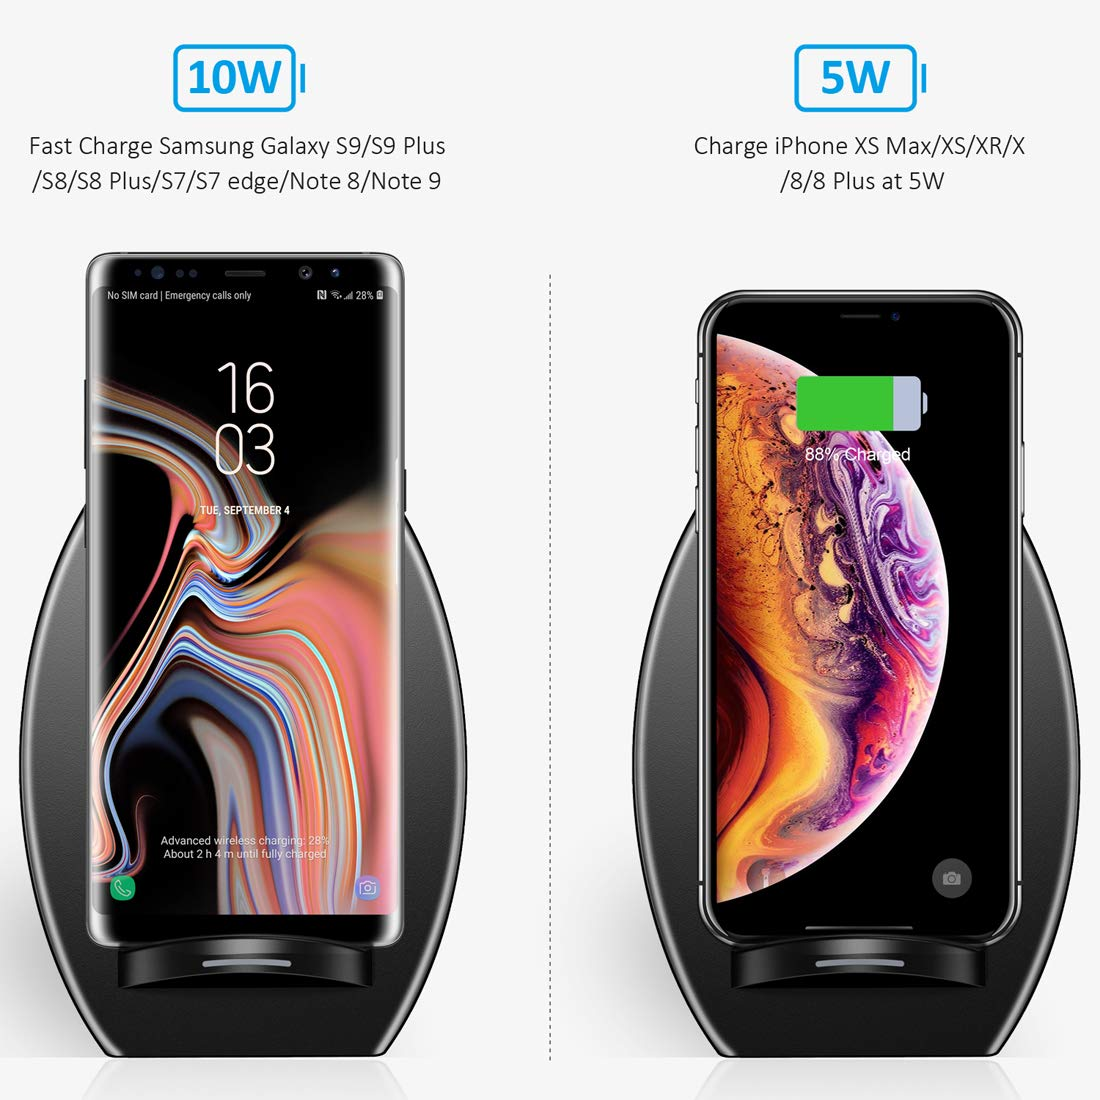 iPhone X,Galaxy Note 8//S8//S8 Plus//S7//S7 Edge//S6 Edge Plus CHOETECH Cargador Inal/ámbrico R/ápido Qi Soporte Wireless Charger Carga R/ápida con Ventilador de refrigeraci/ón para iPhone 8//8 Plus